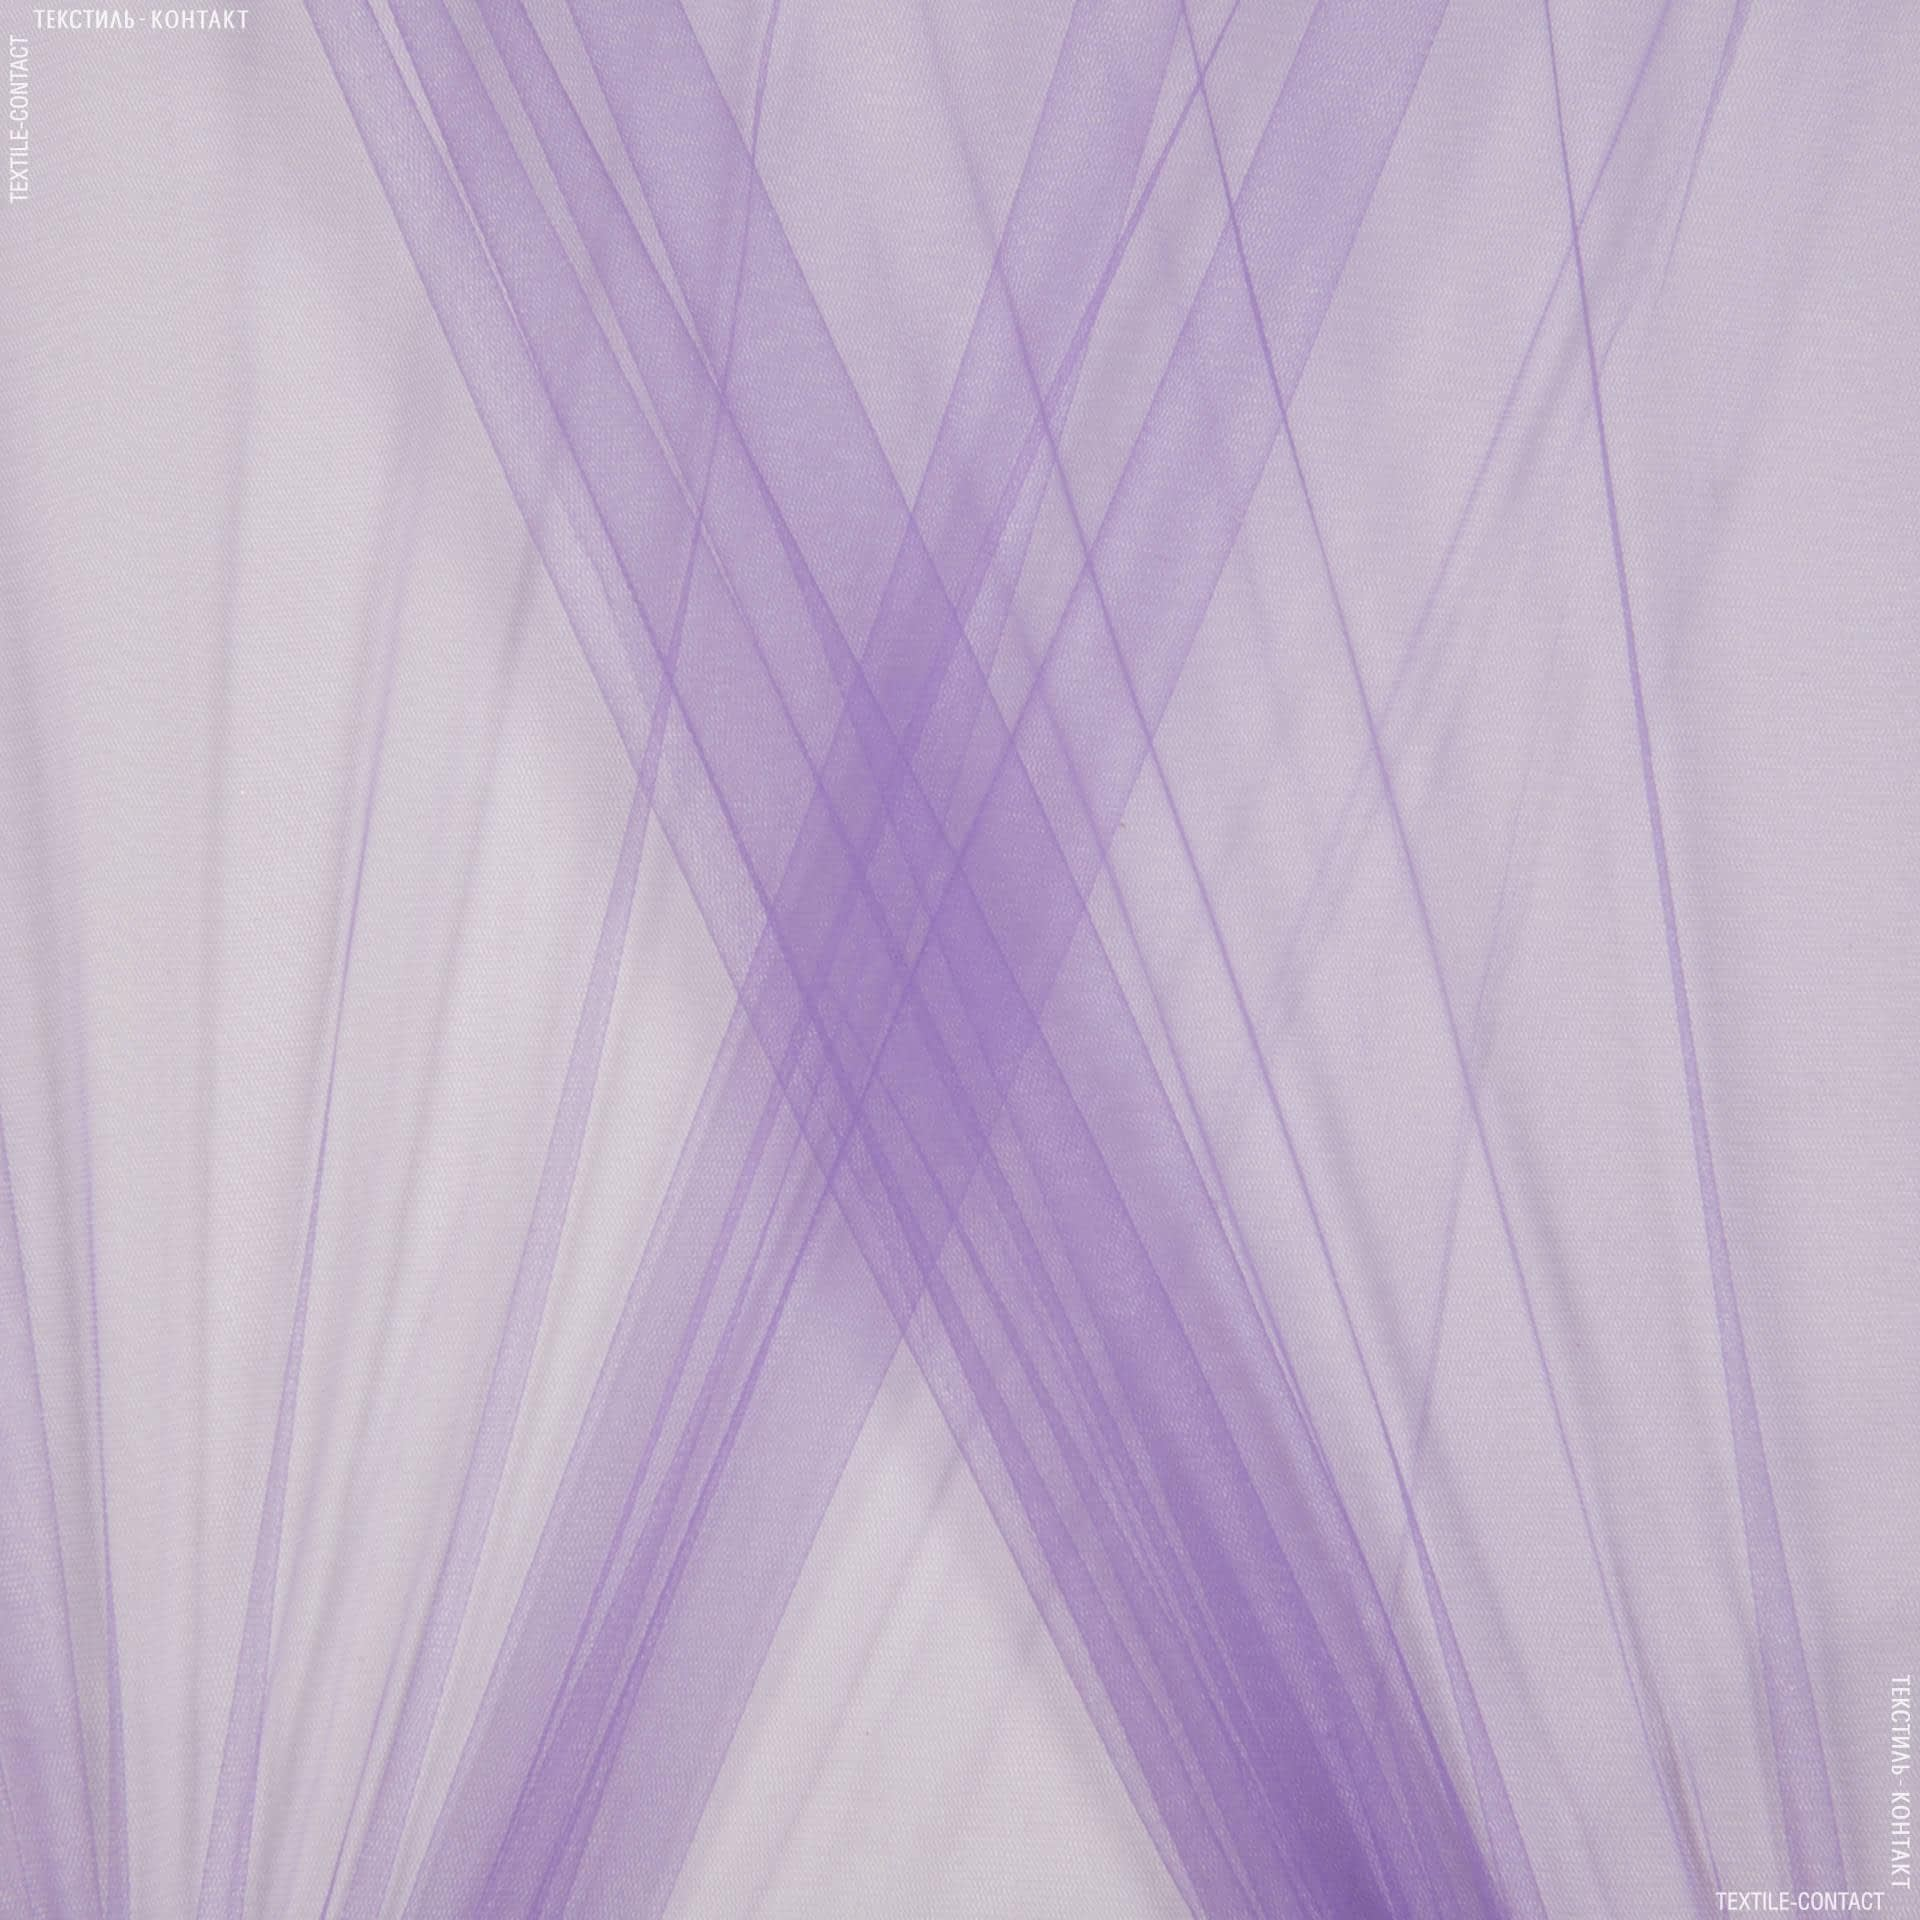 Ткани для платьев - Фатин мягкий темно-сиреневый